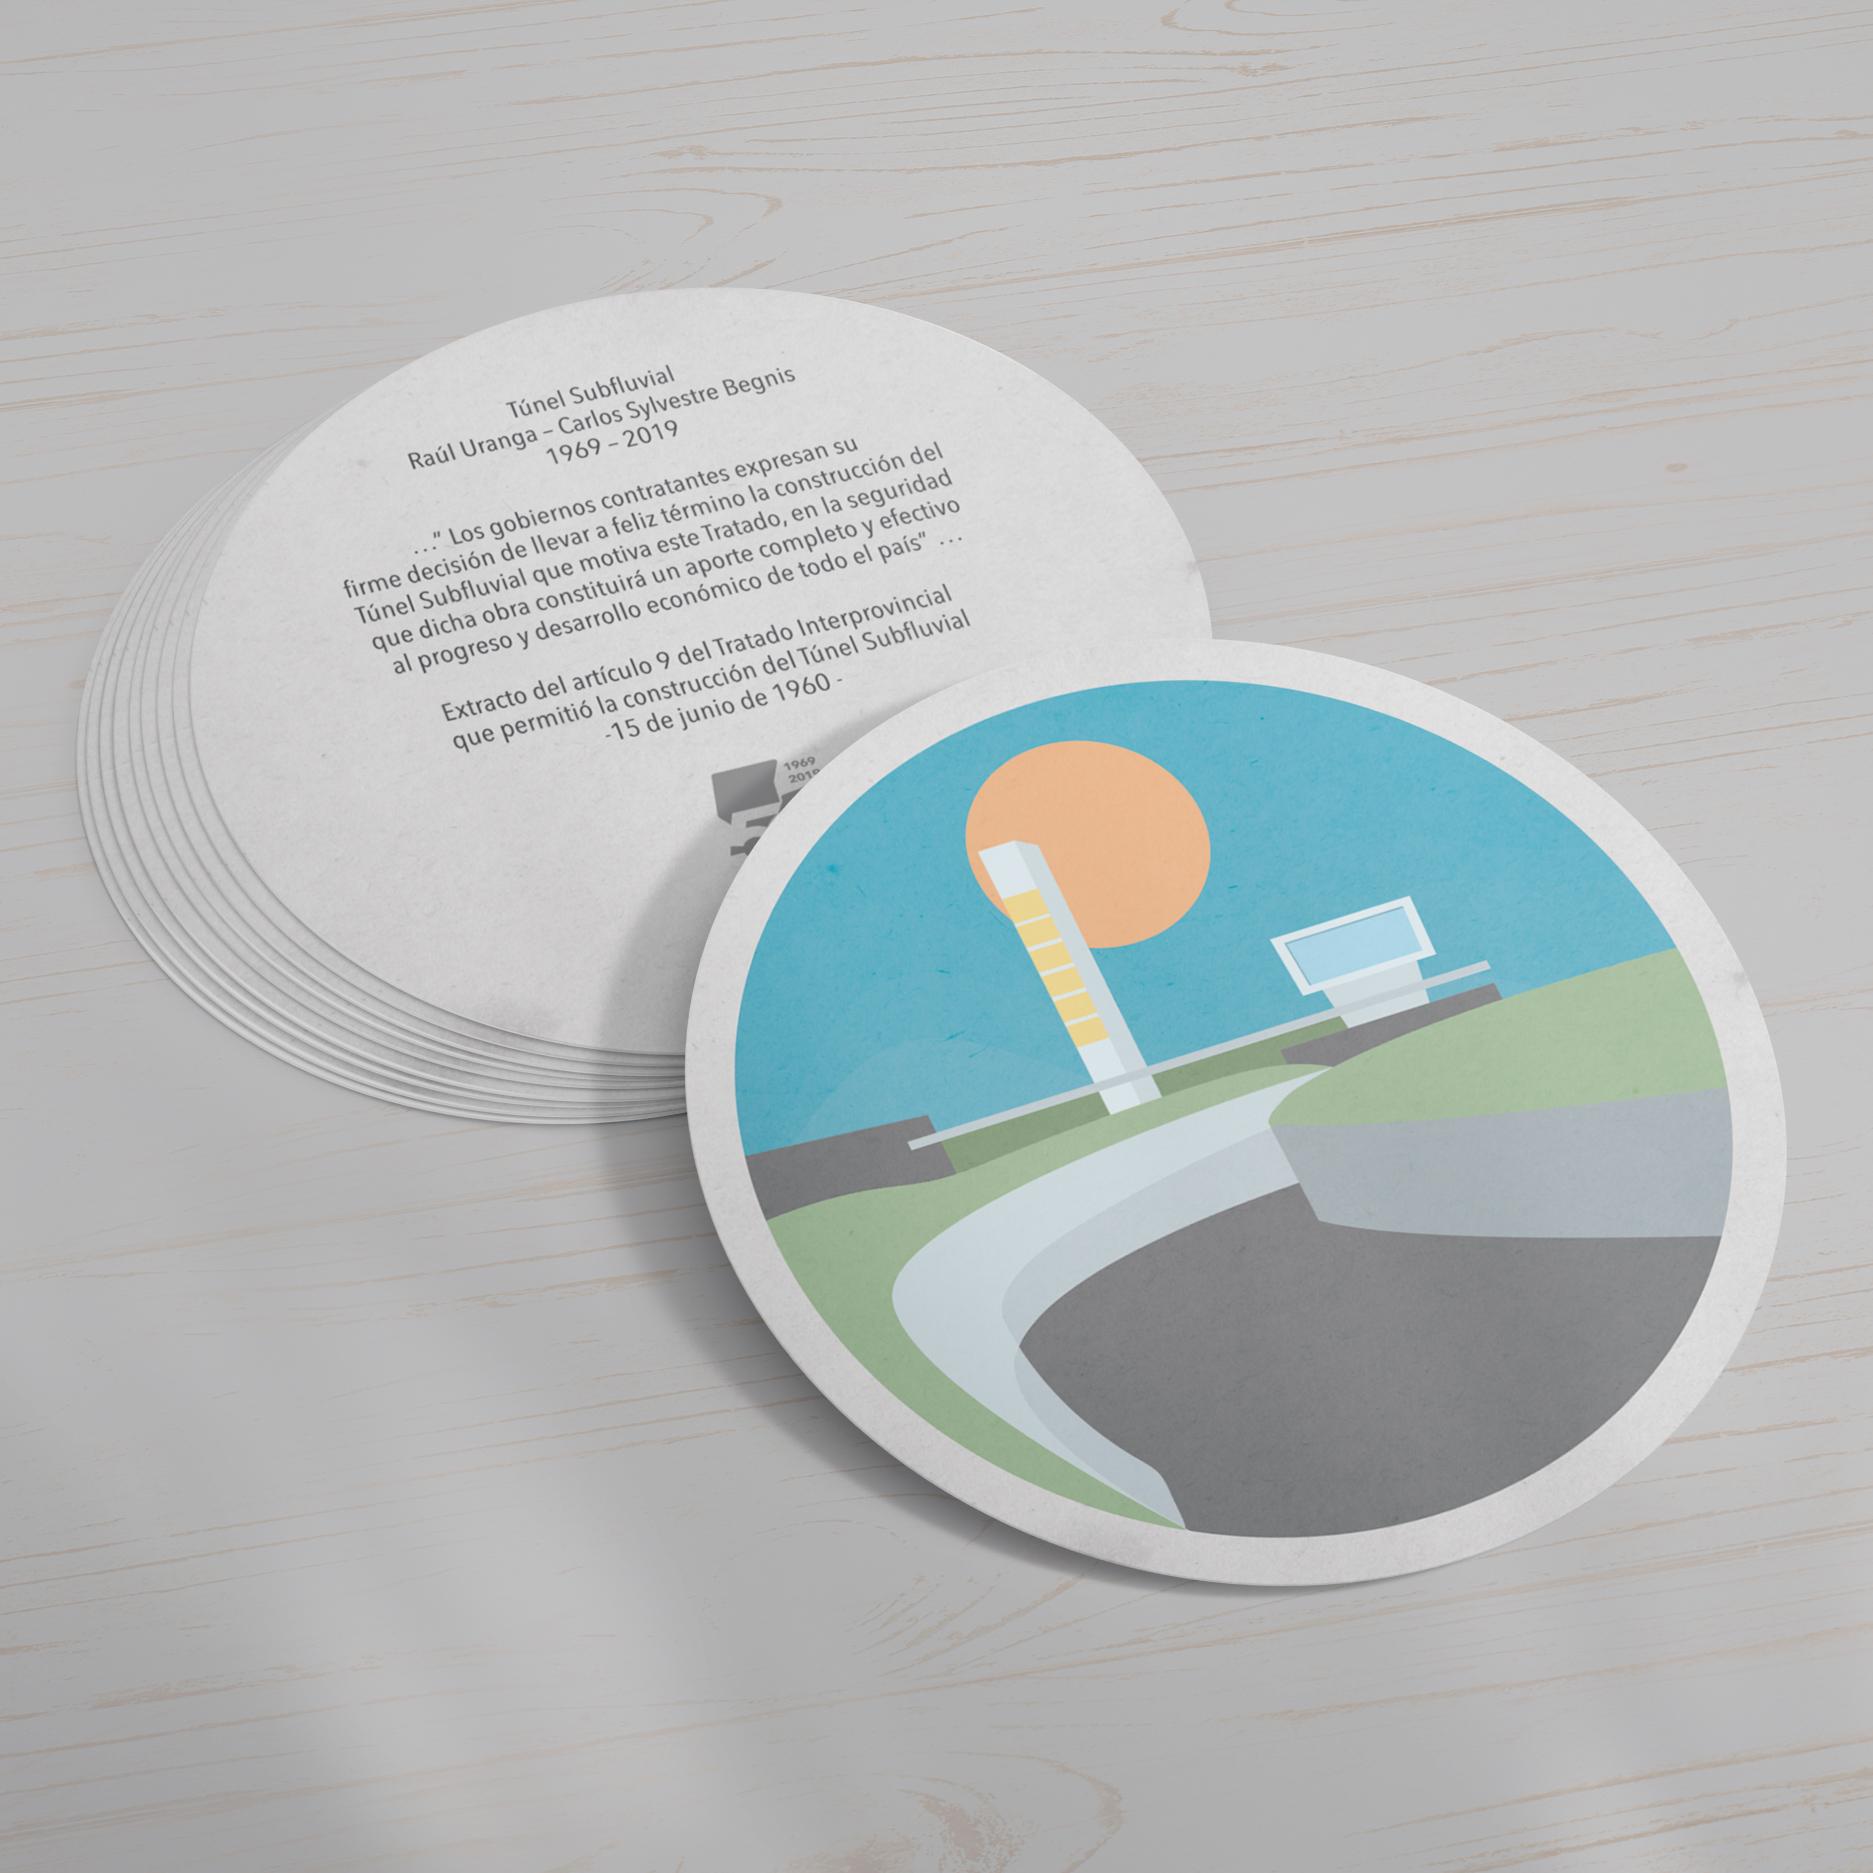 Túnel Subfluavial diseño postales 50 aniversario